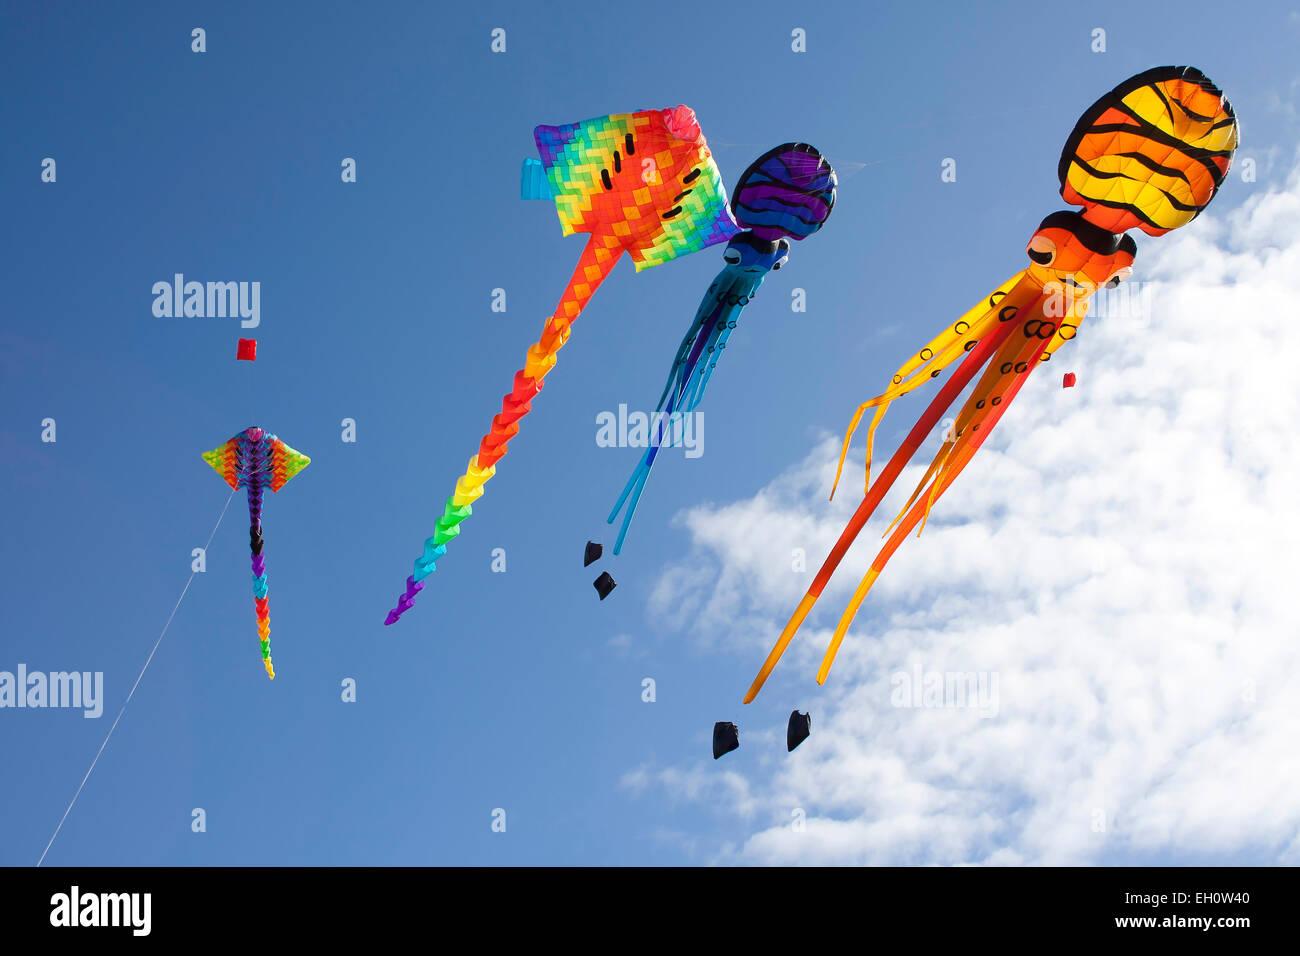 Kites flying over Bastion Point, in celebration of Matariki, the Maori New Year. Auckland, New Zealand. - Stock Image